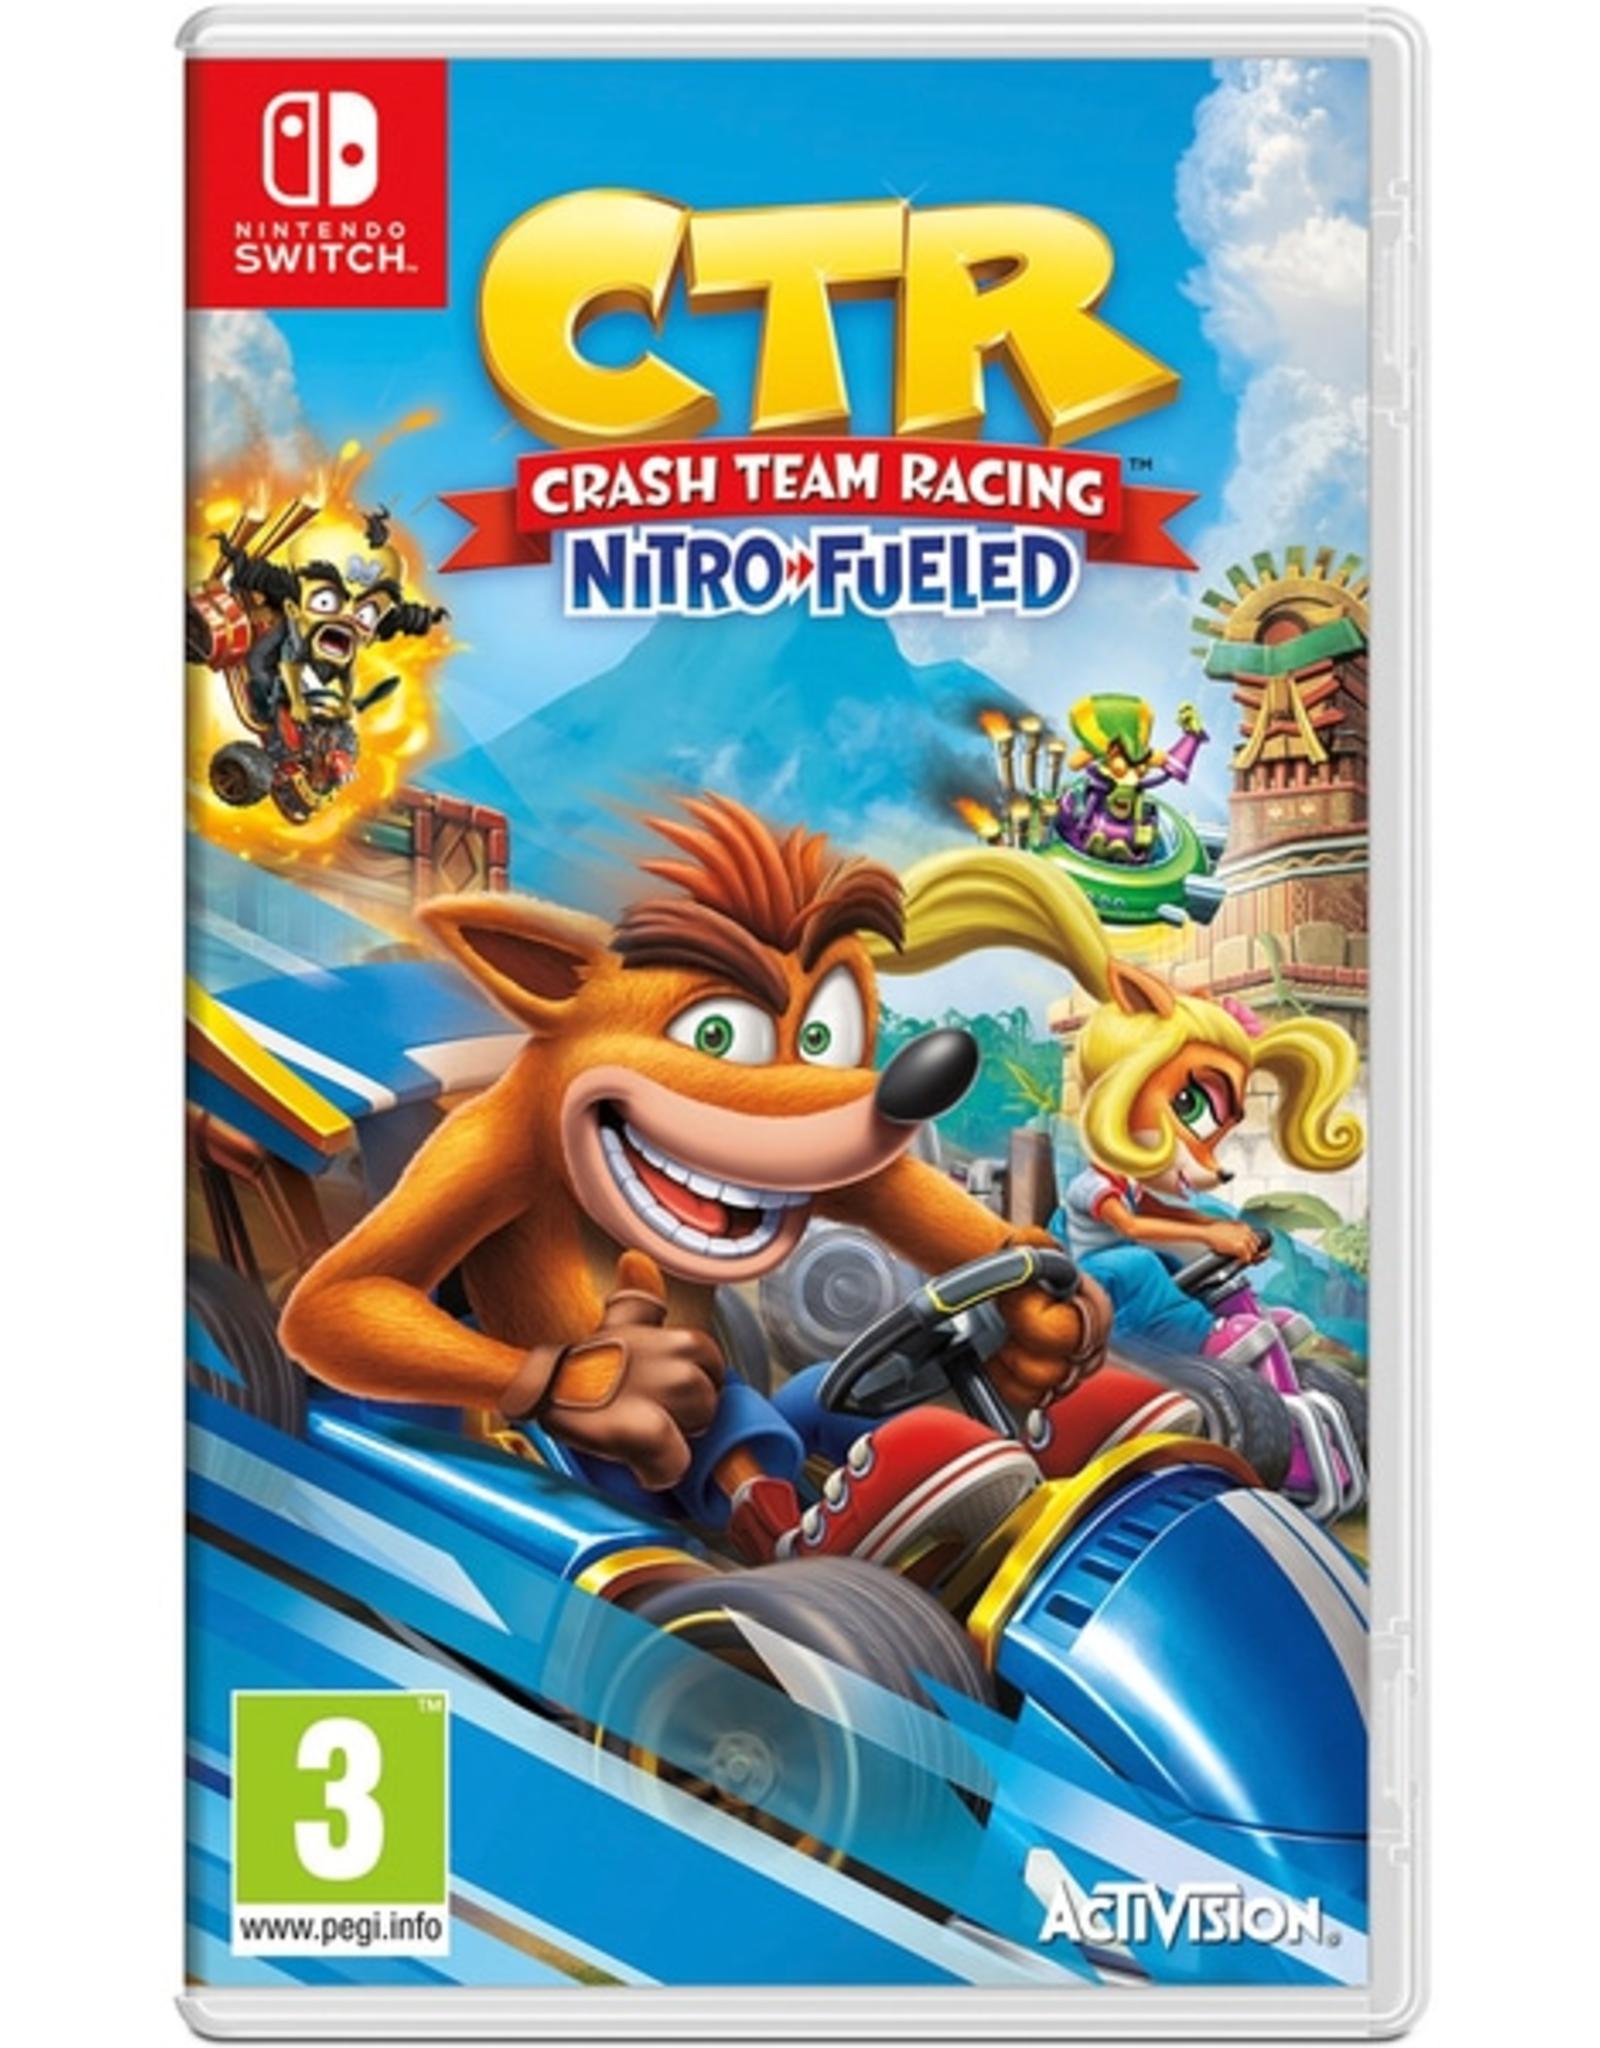 Crash Team Racing Nitro Fueled - SWITCH NEW